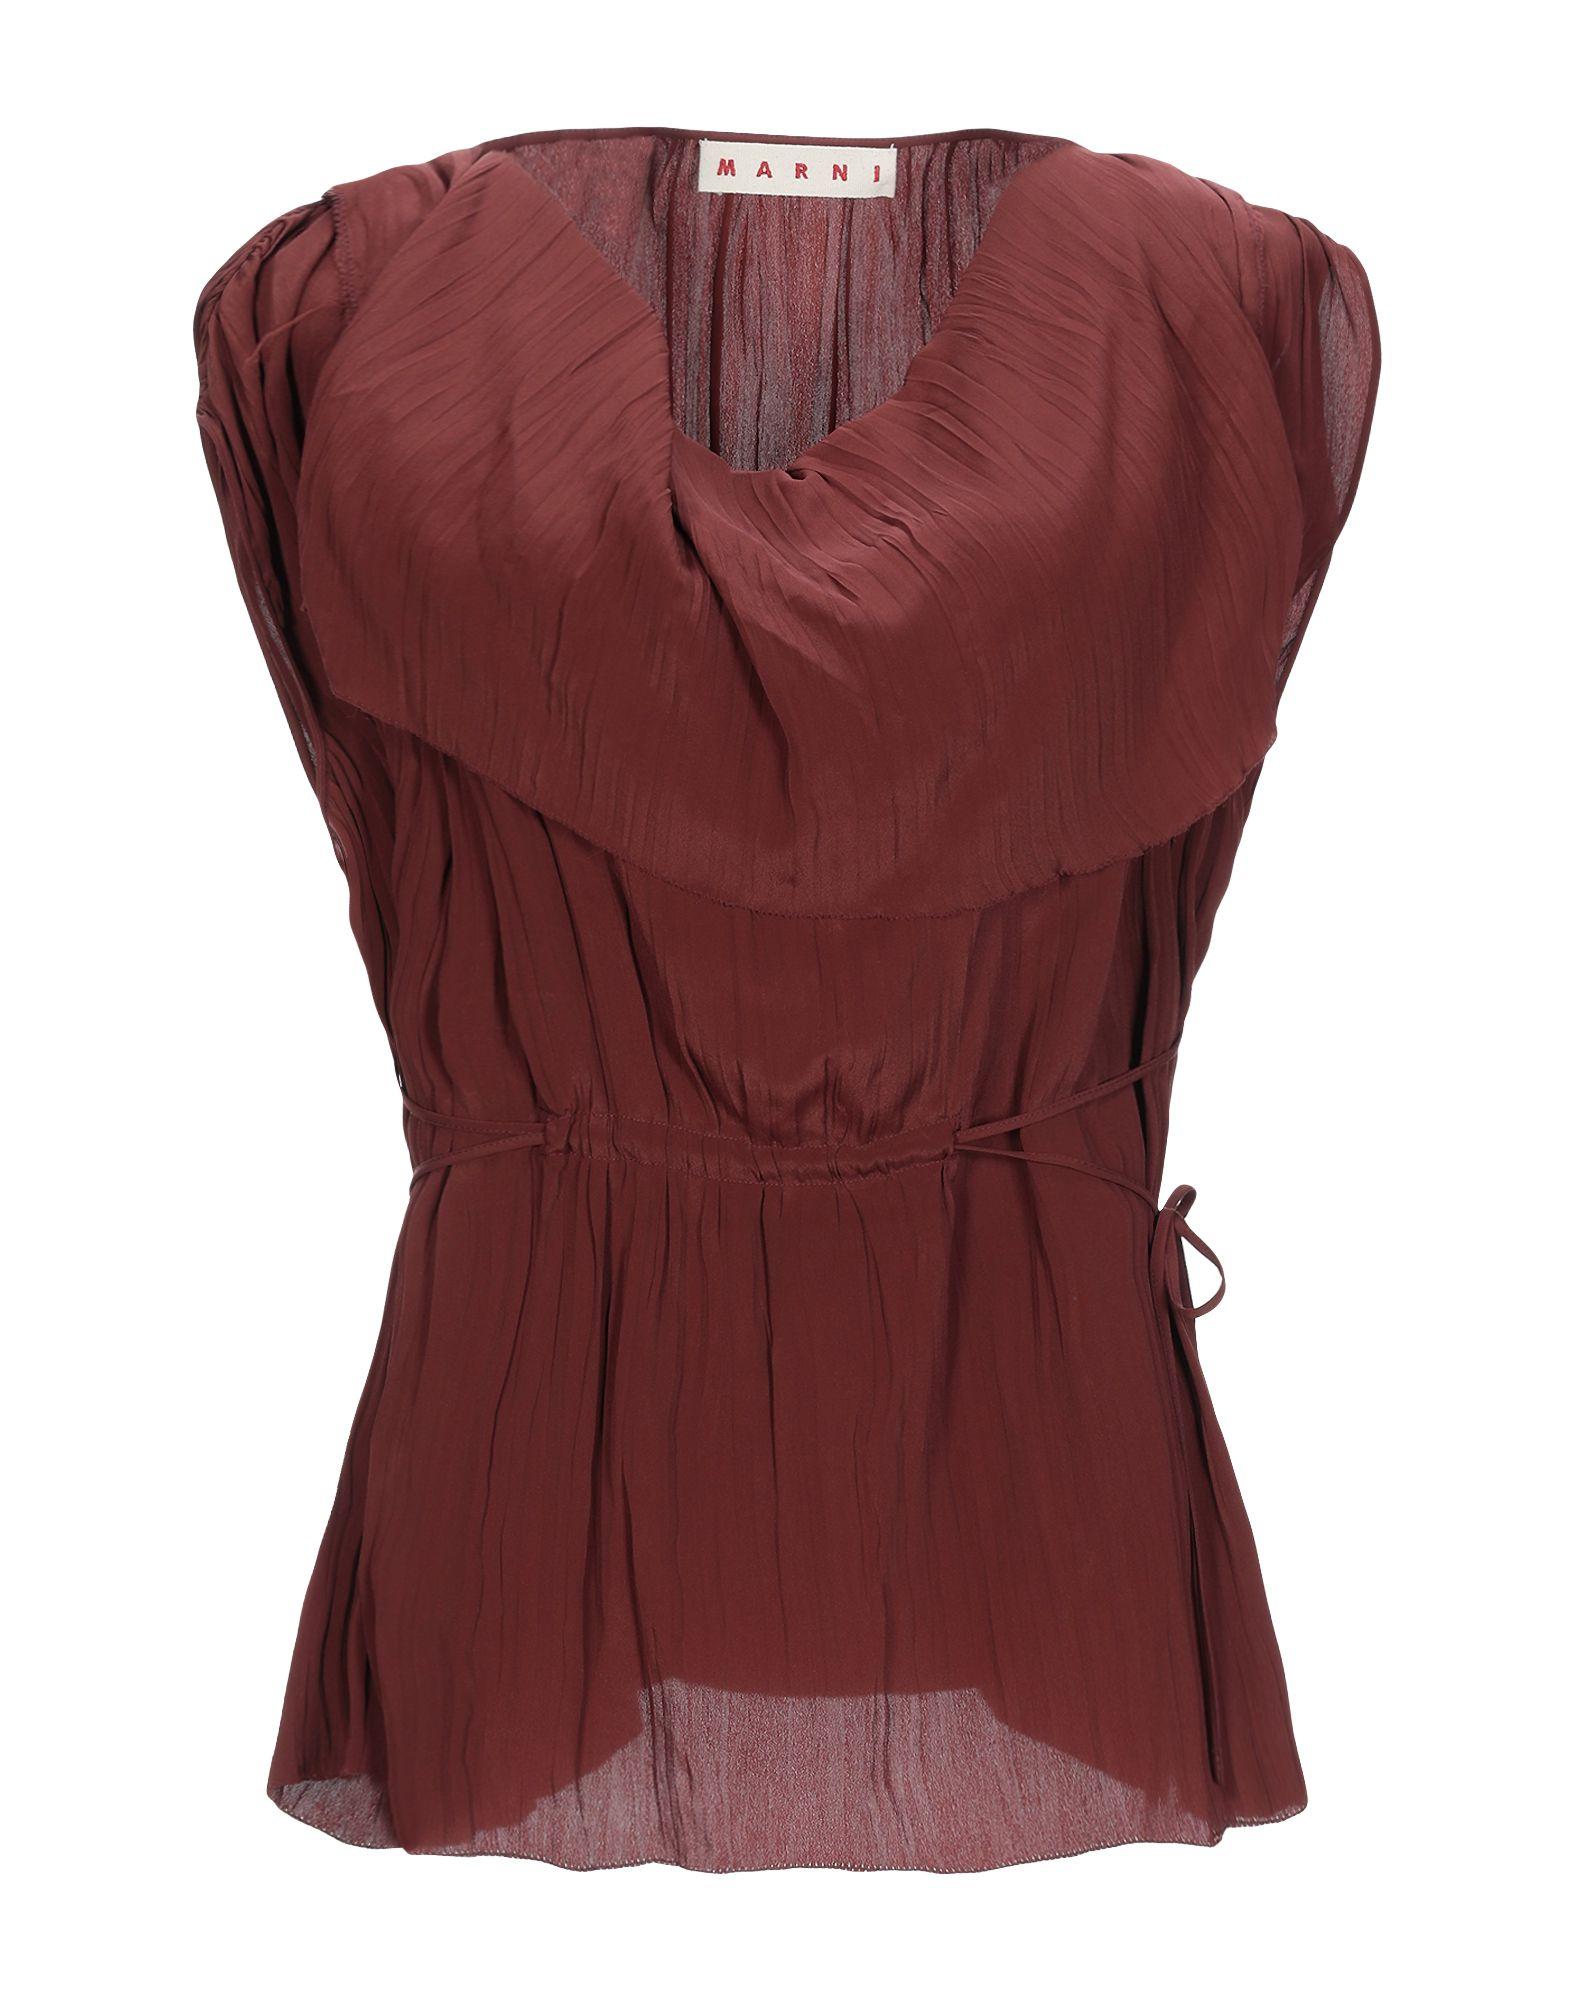 marni блузка MARNI Блузка